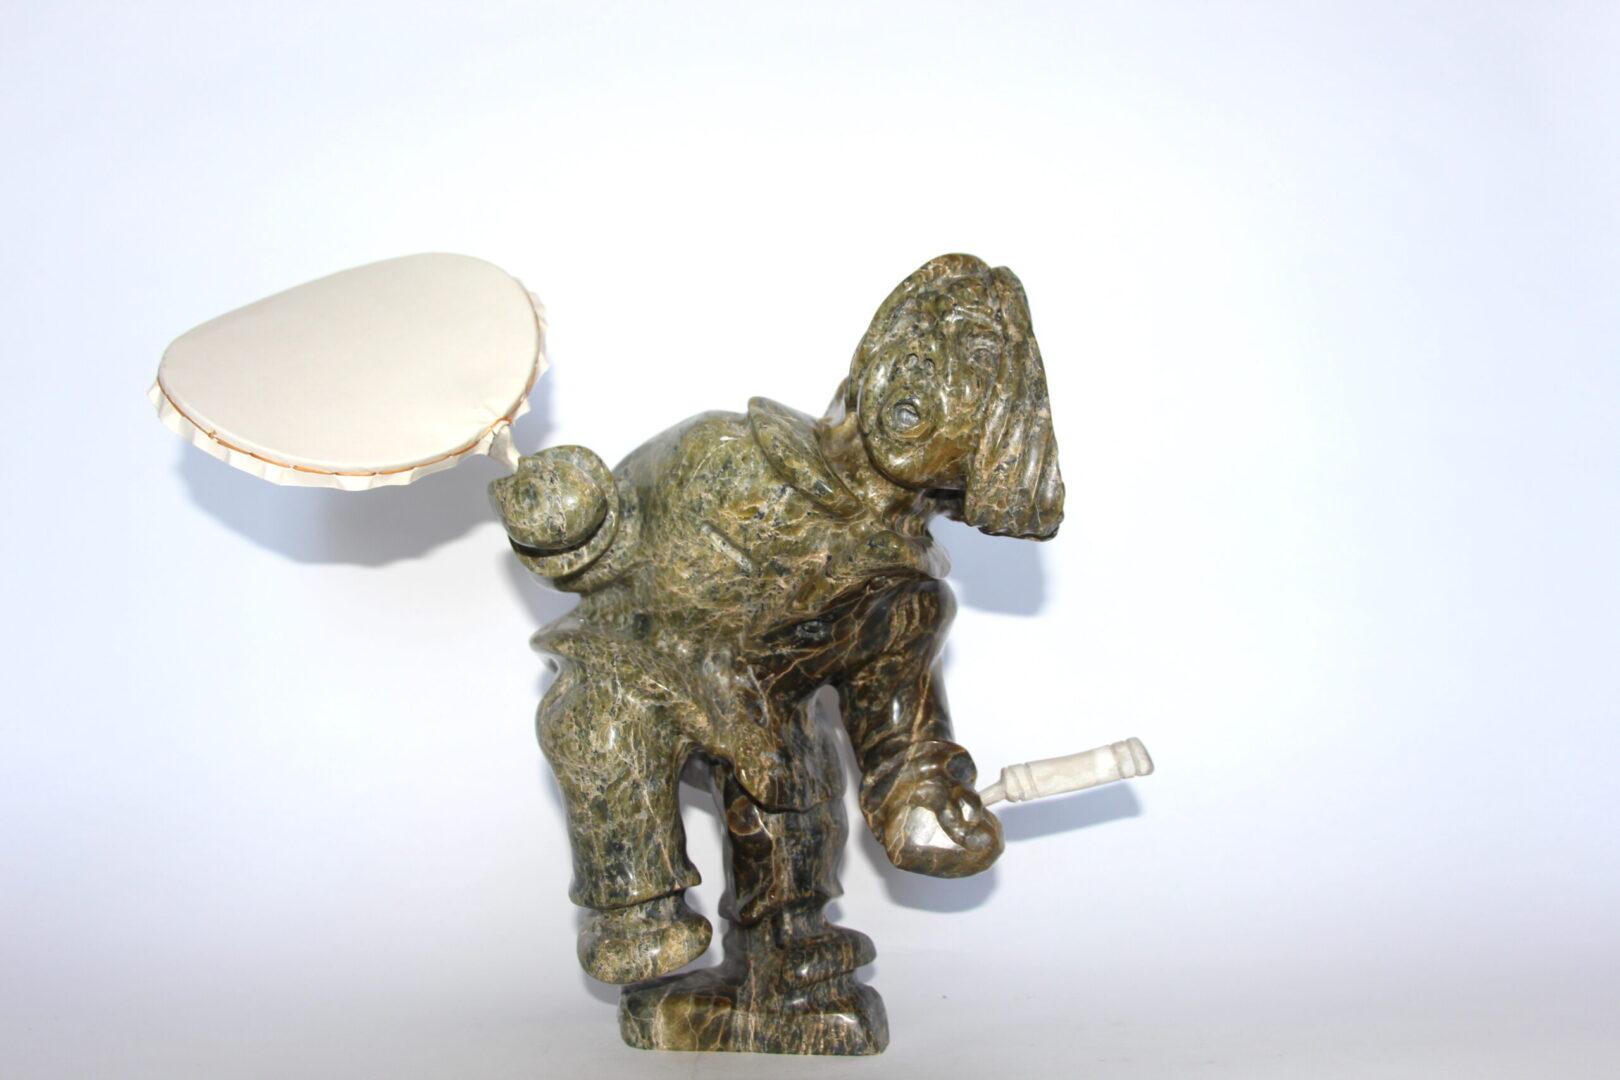 drum dancer Inuit Art Sculpture in Serpentine and caribou antler